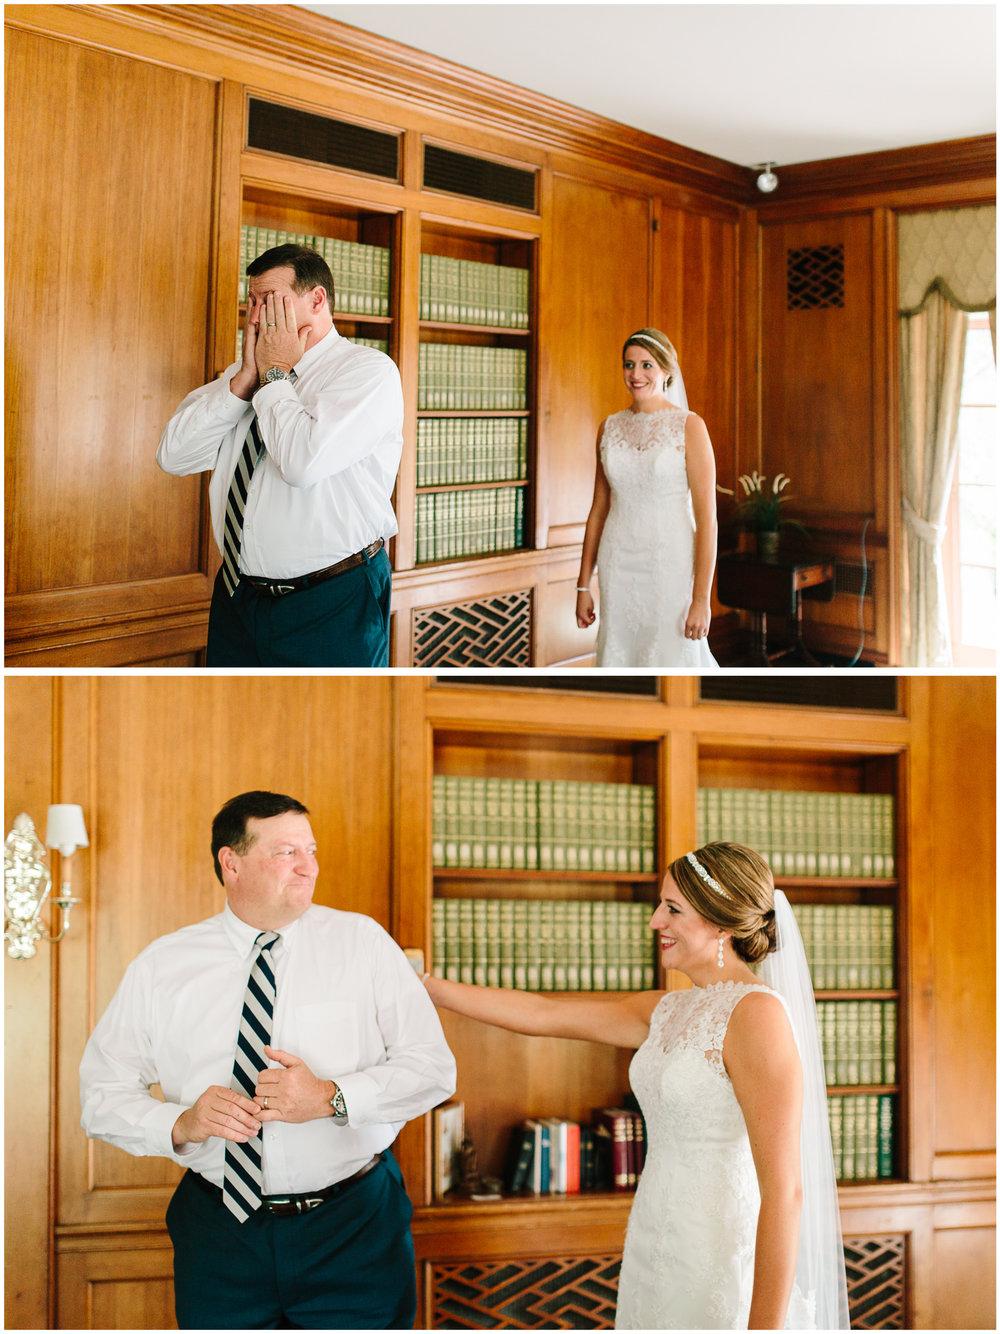 ann_arbor_michigan_wedding_19.jpg